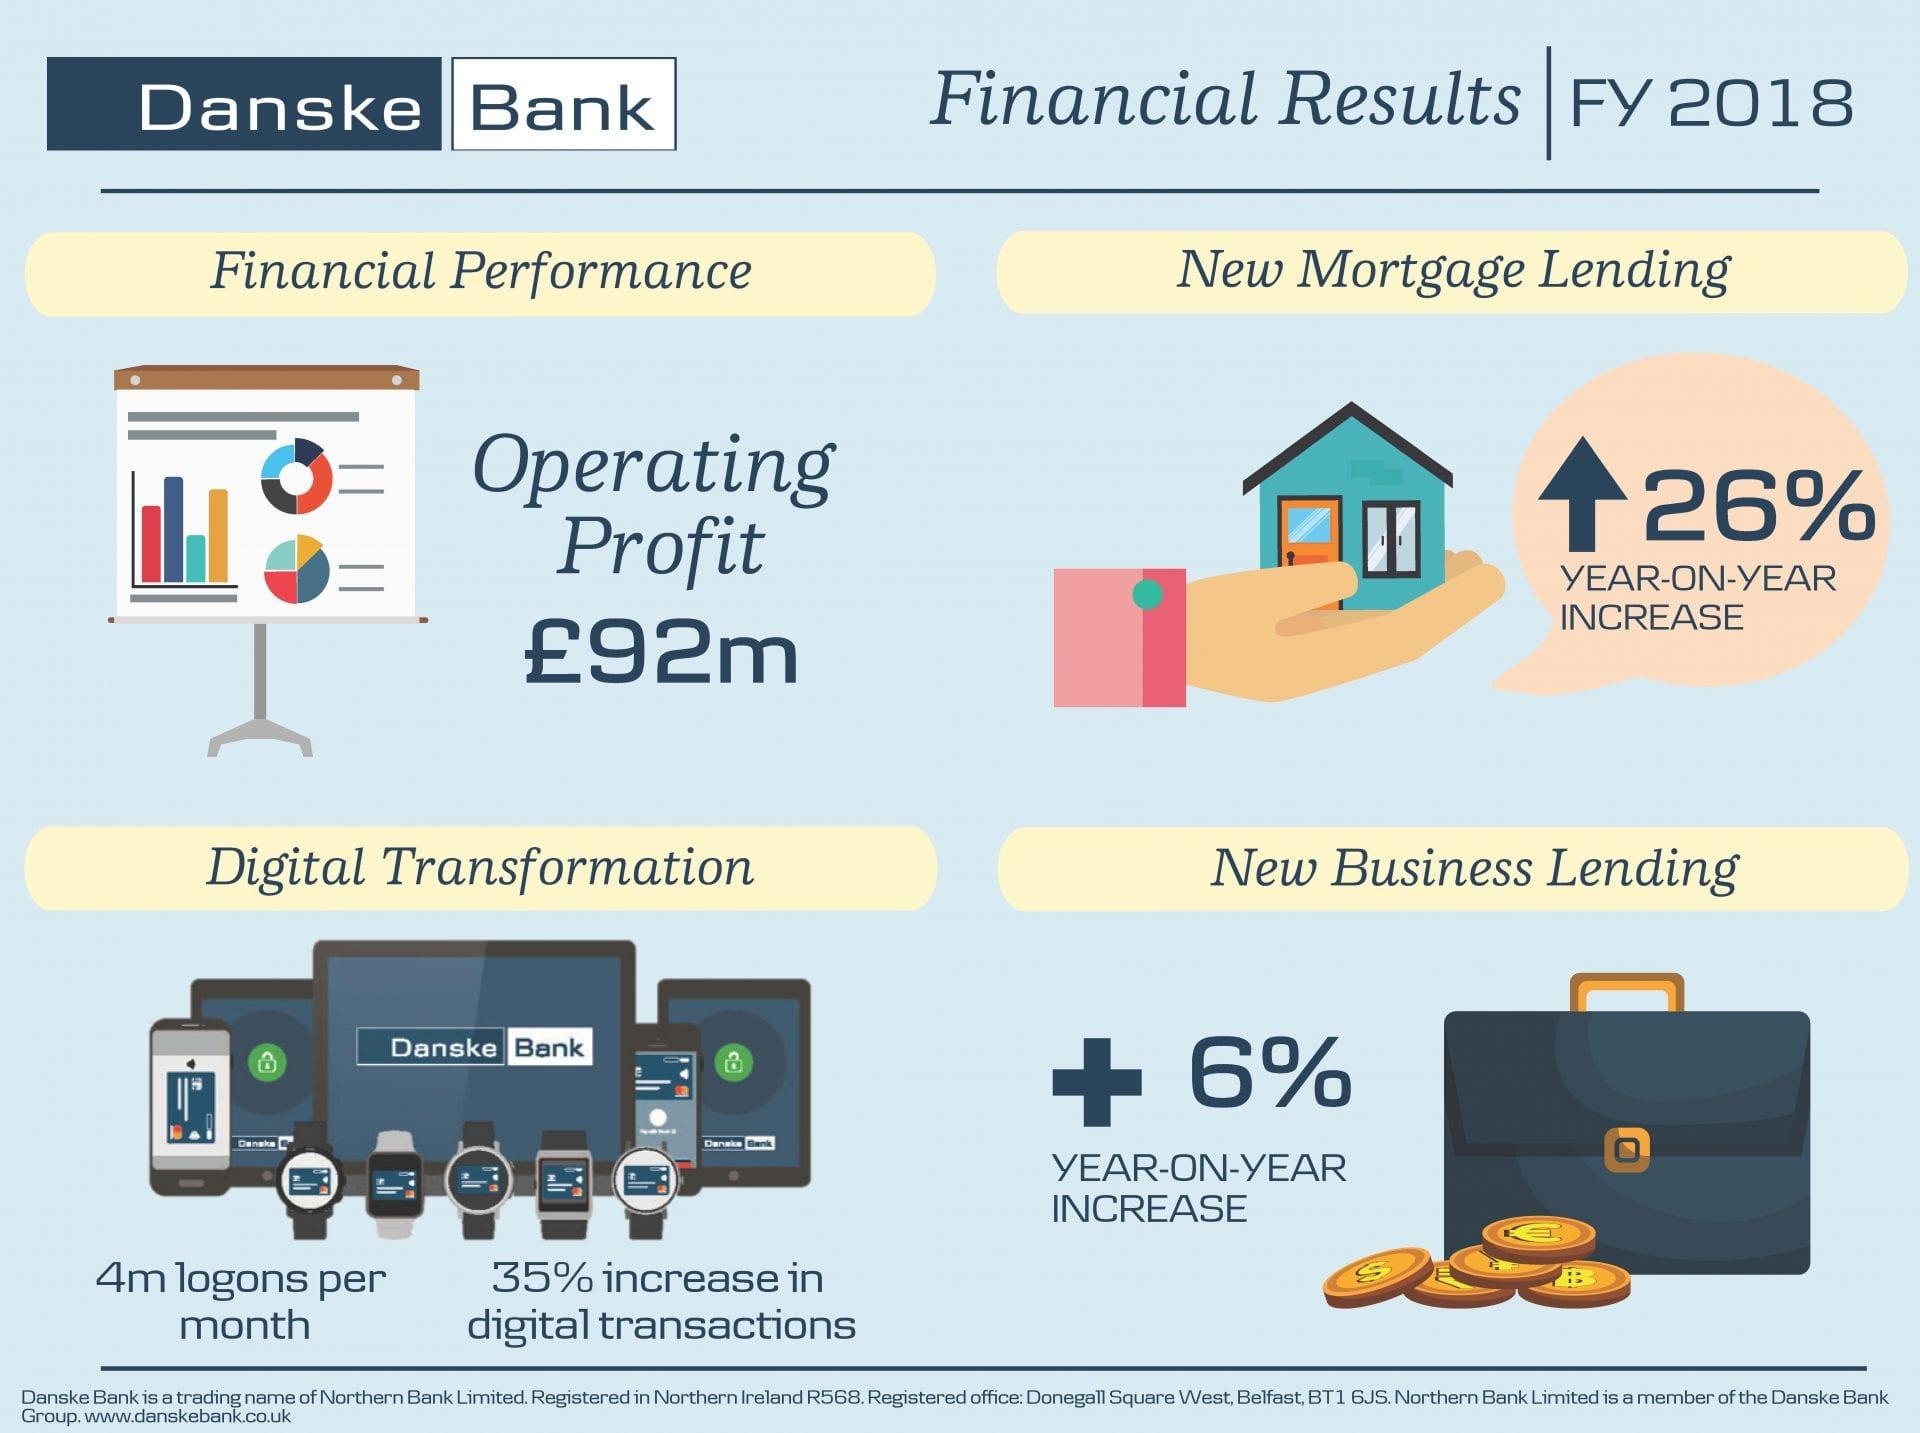 Danske Bank In Northern Ireland Reports A Profit Before